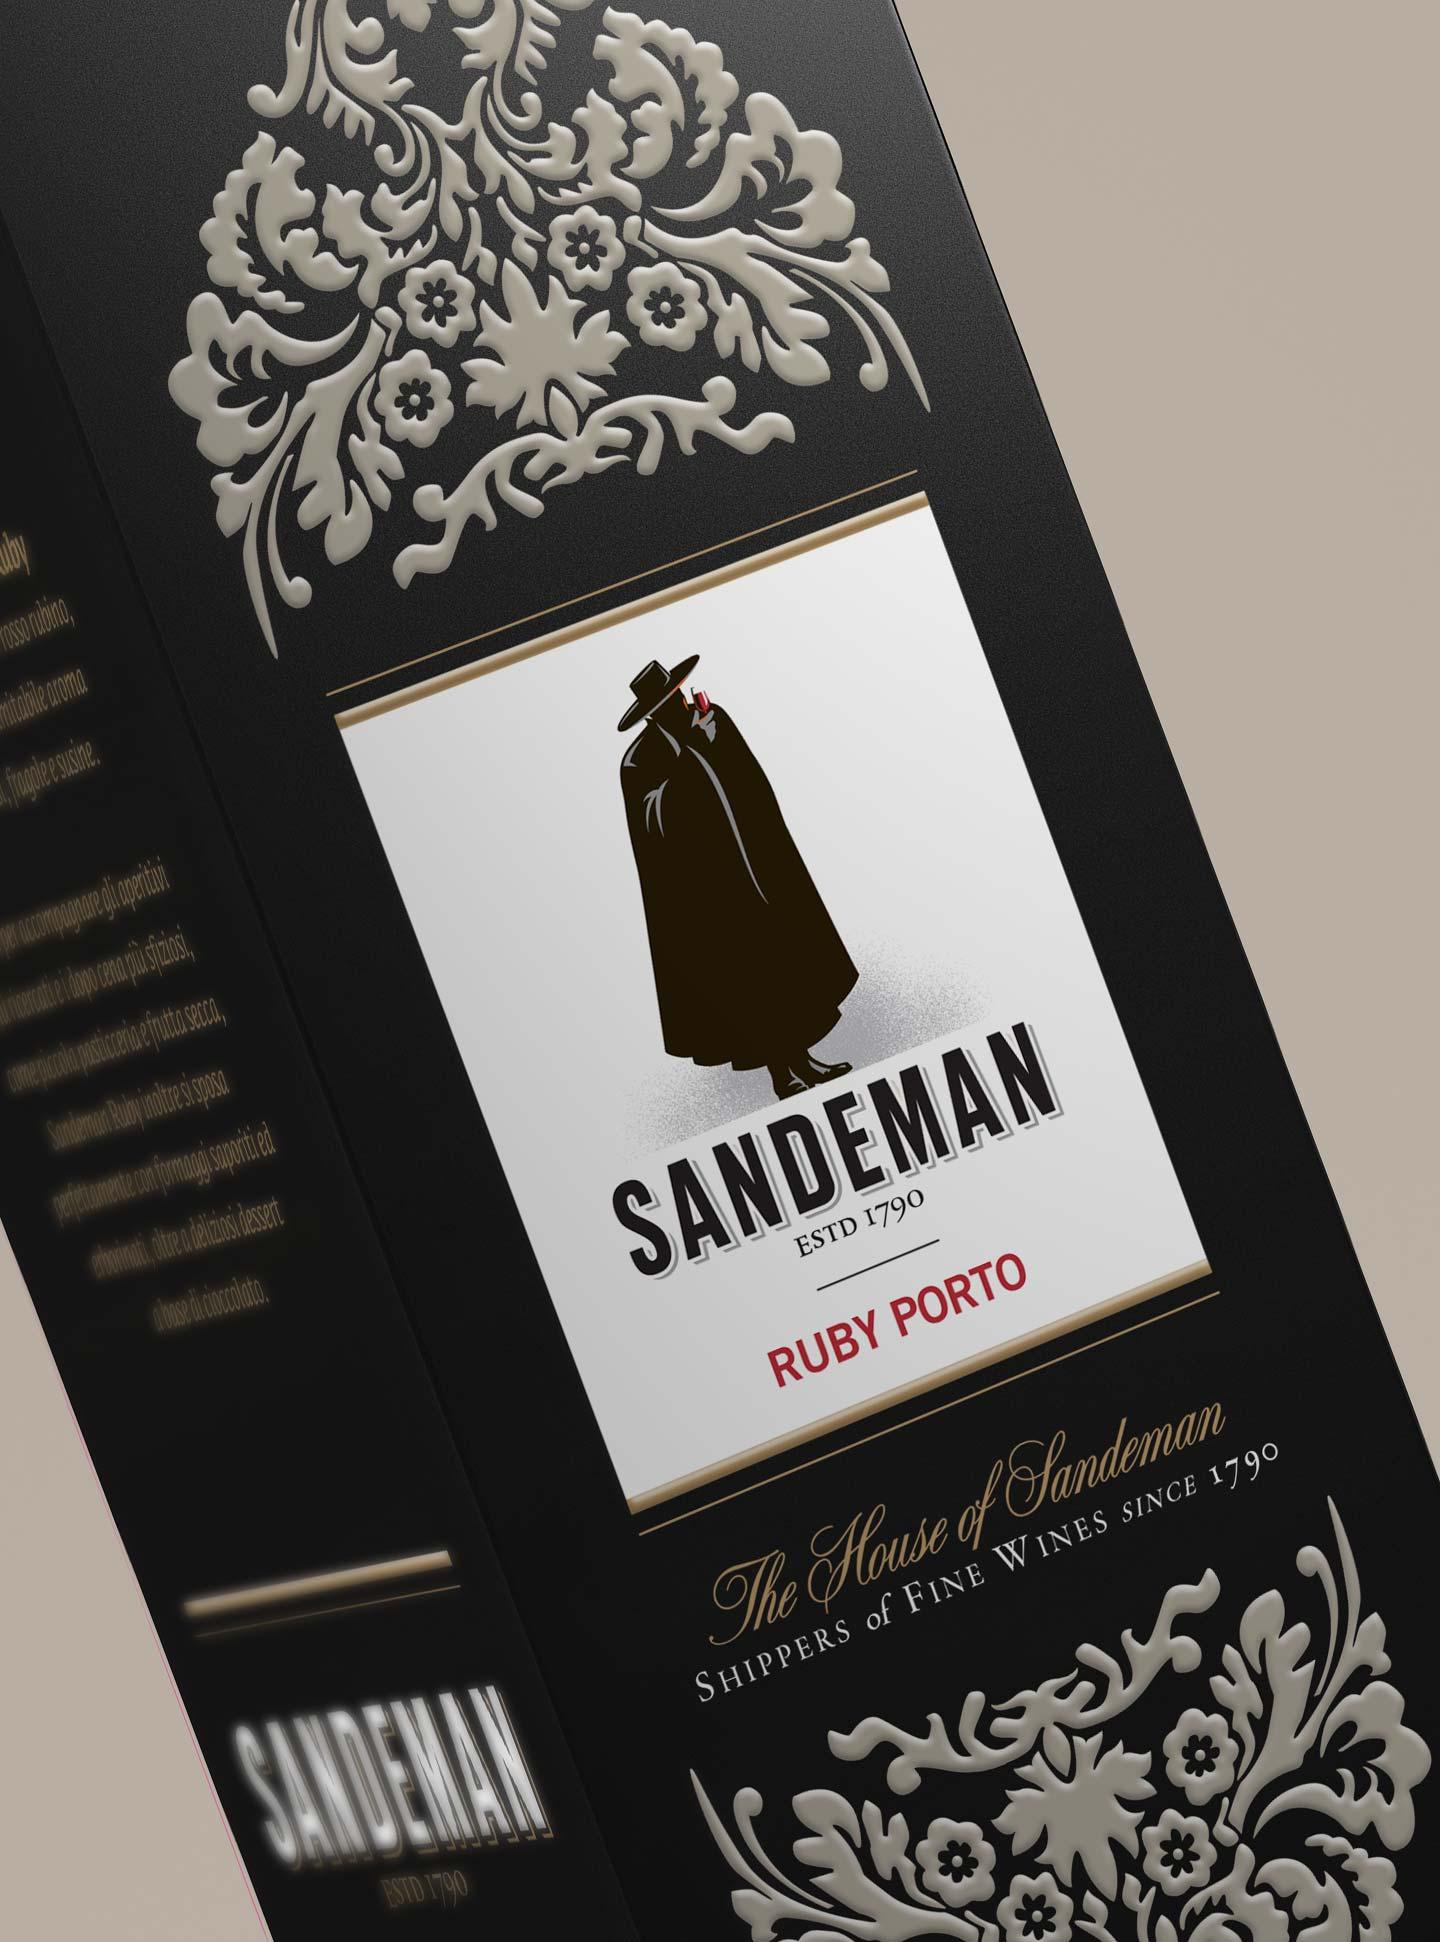 Sandeman